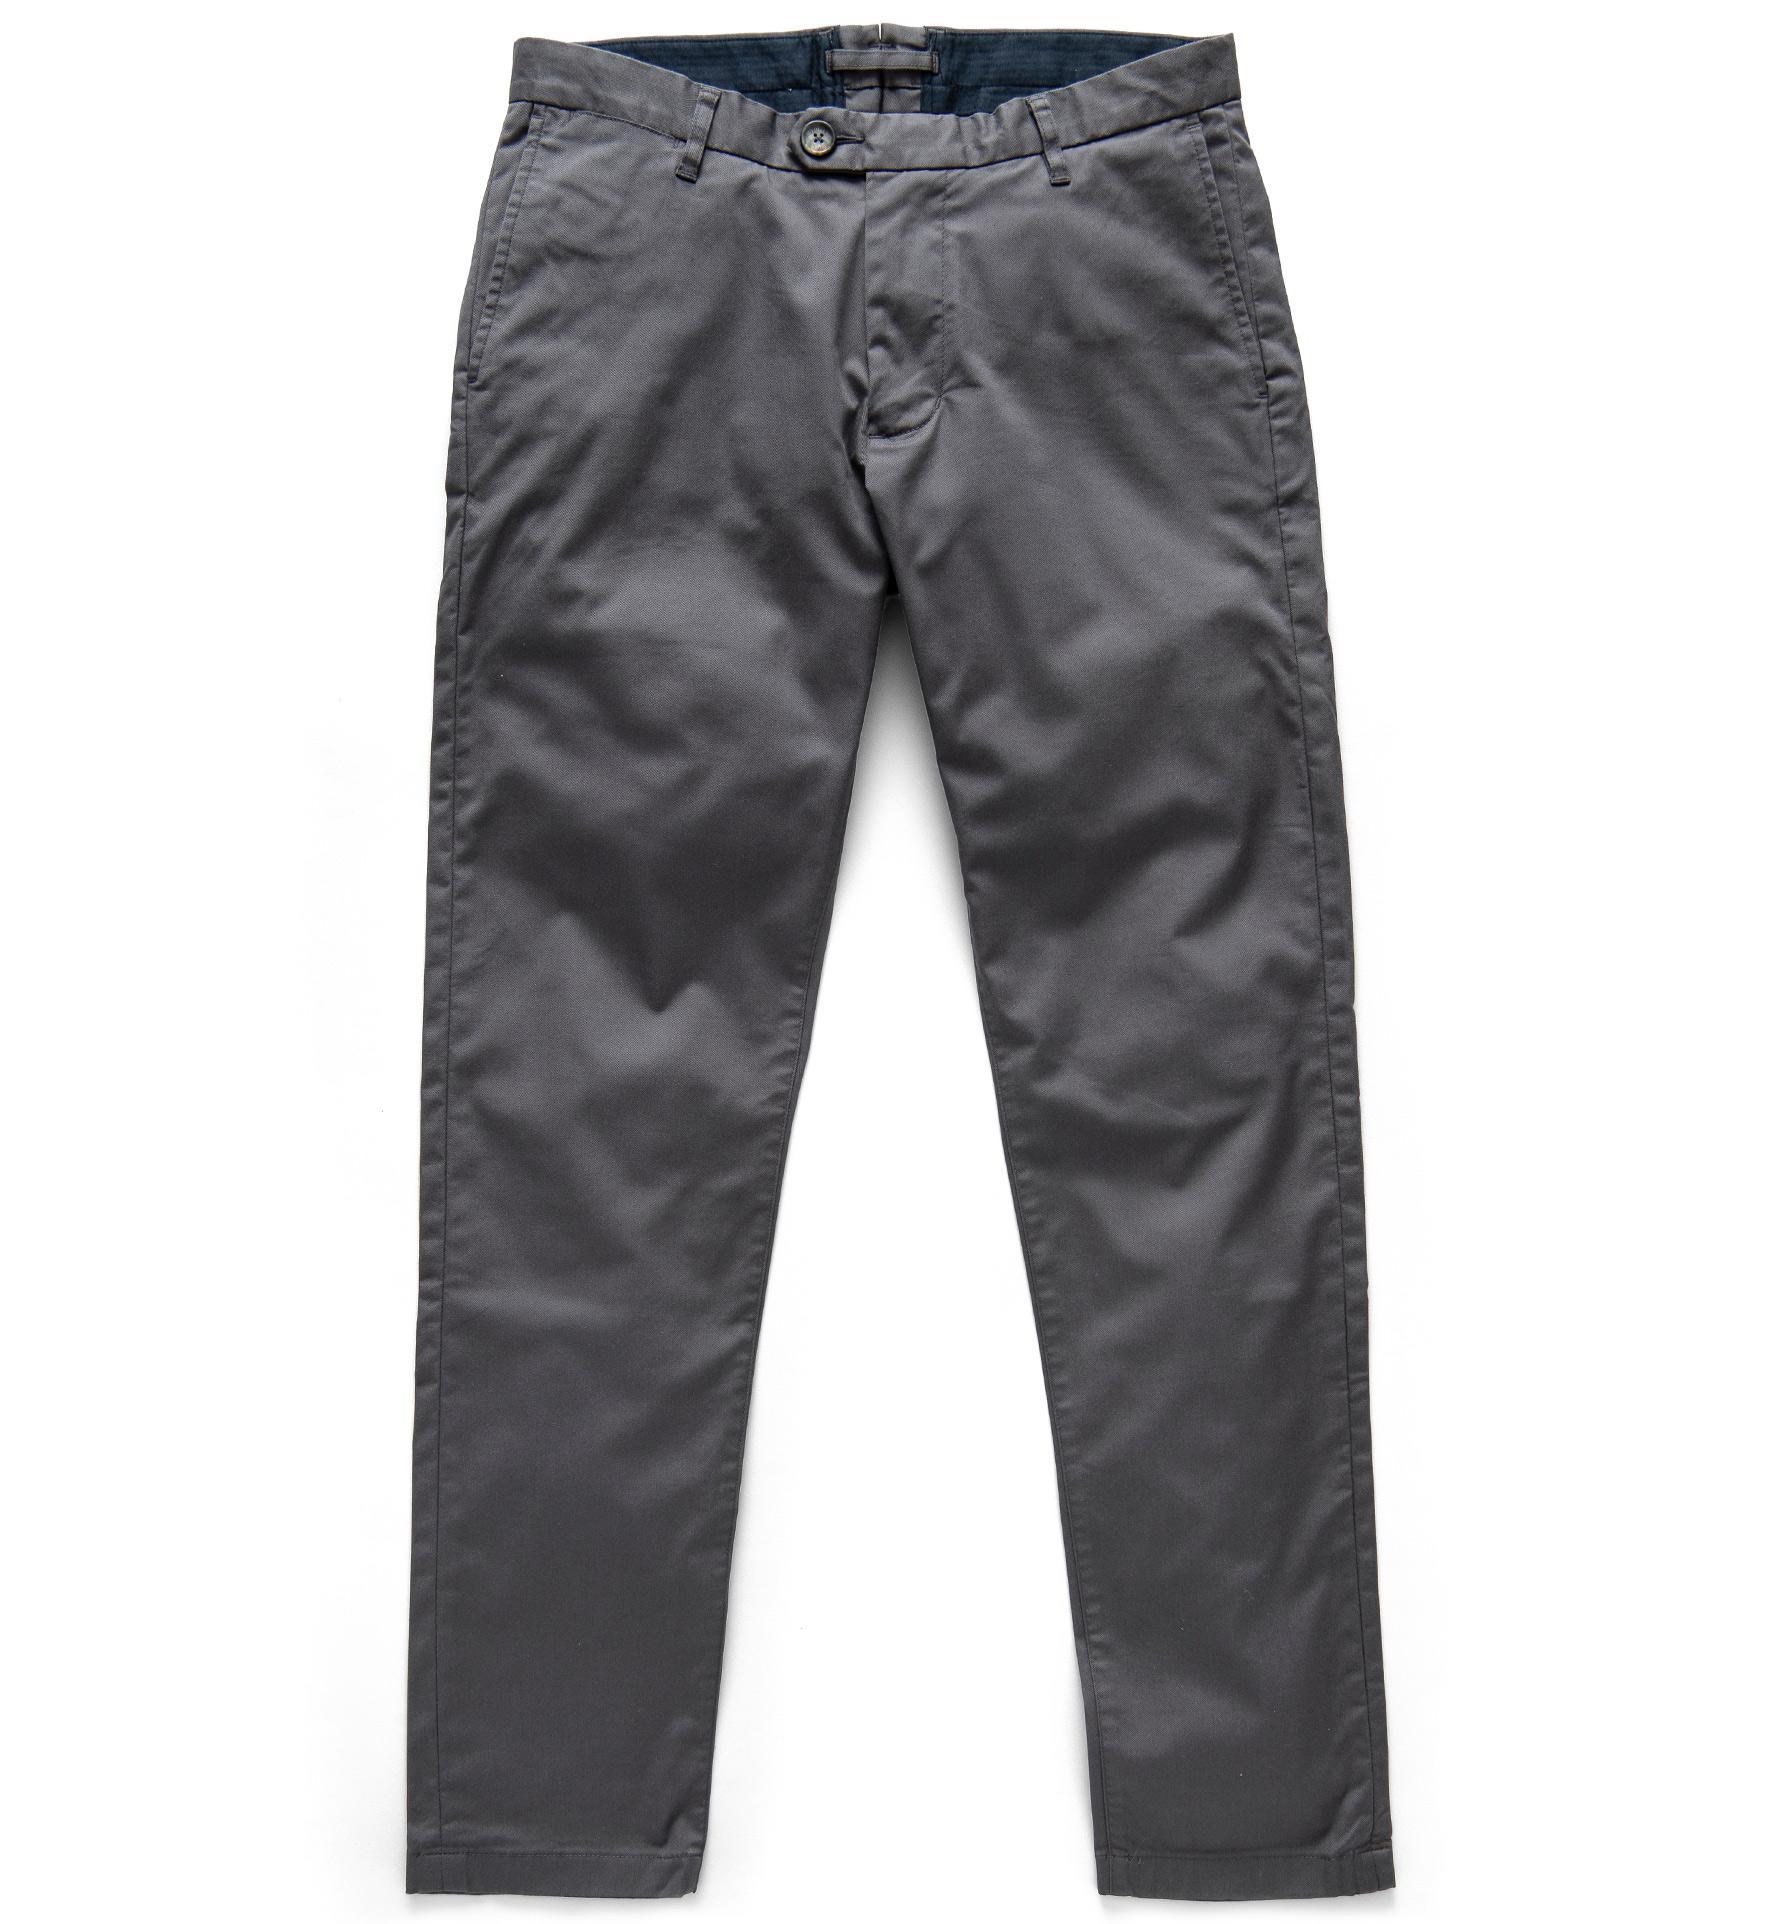 Zoom Image of Bowery Dark Grey Stretch Supima Cotton Chino